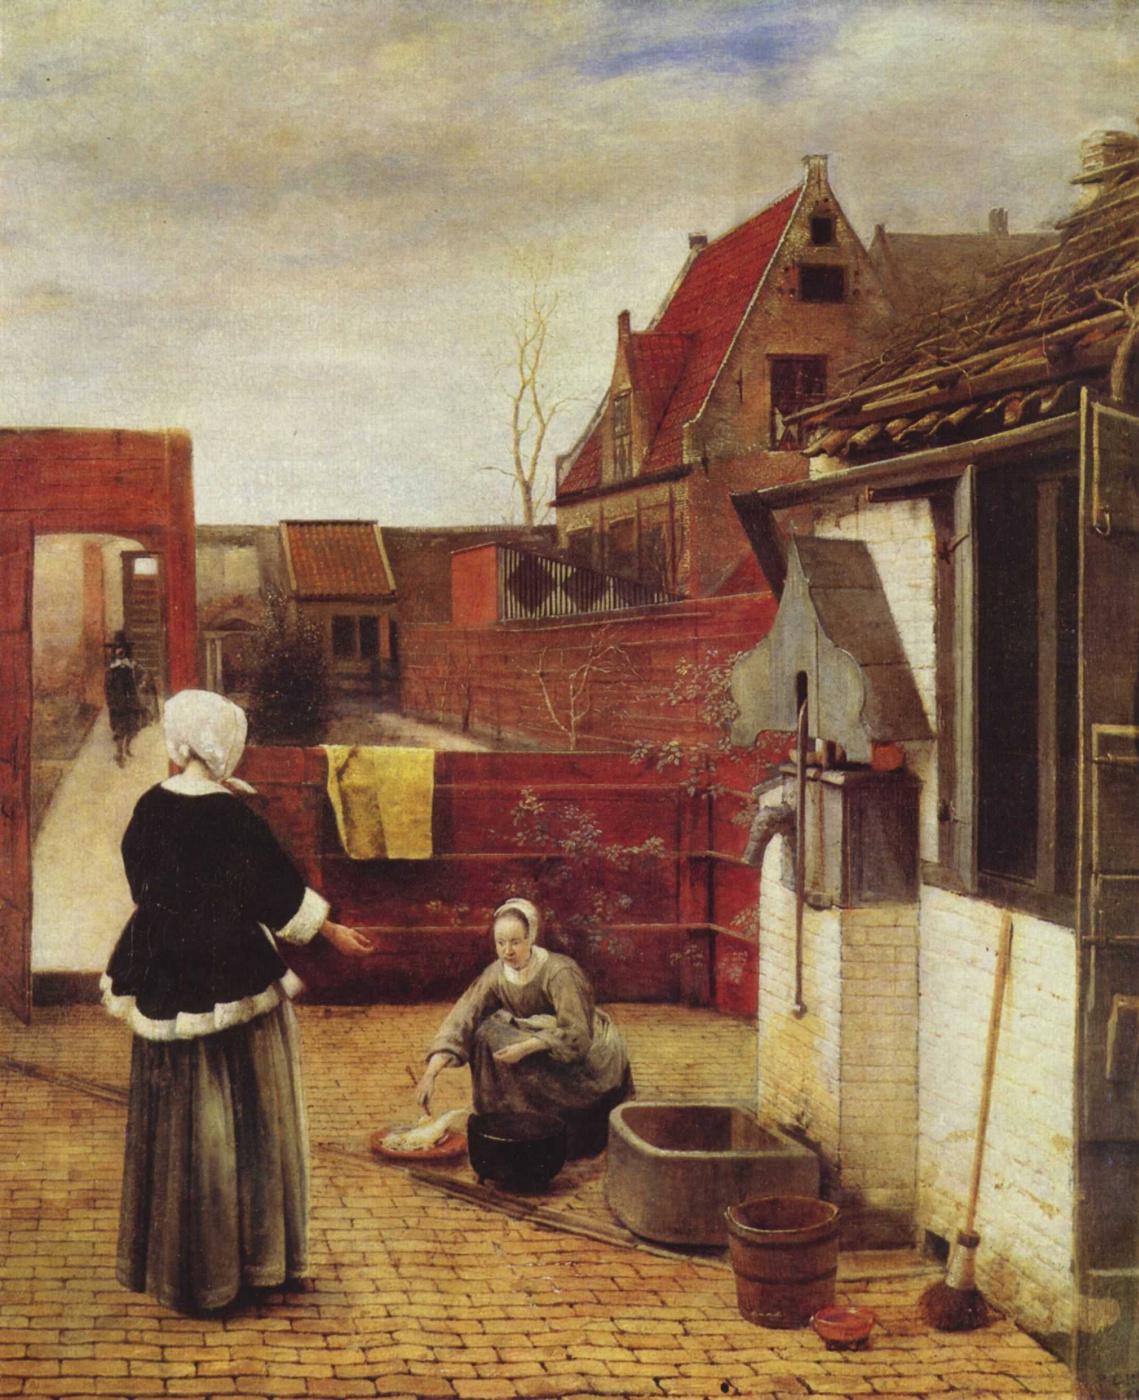 Pieter de Hooch. A Woman and her Maid in a Courtyard